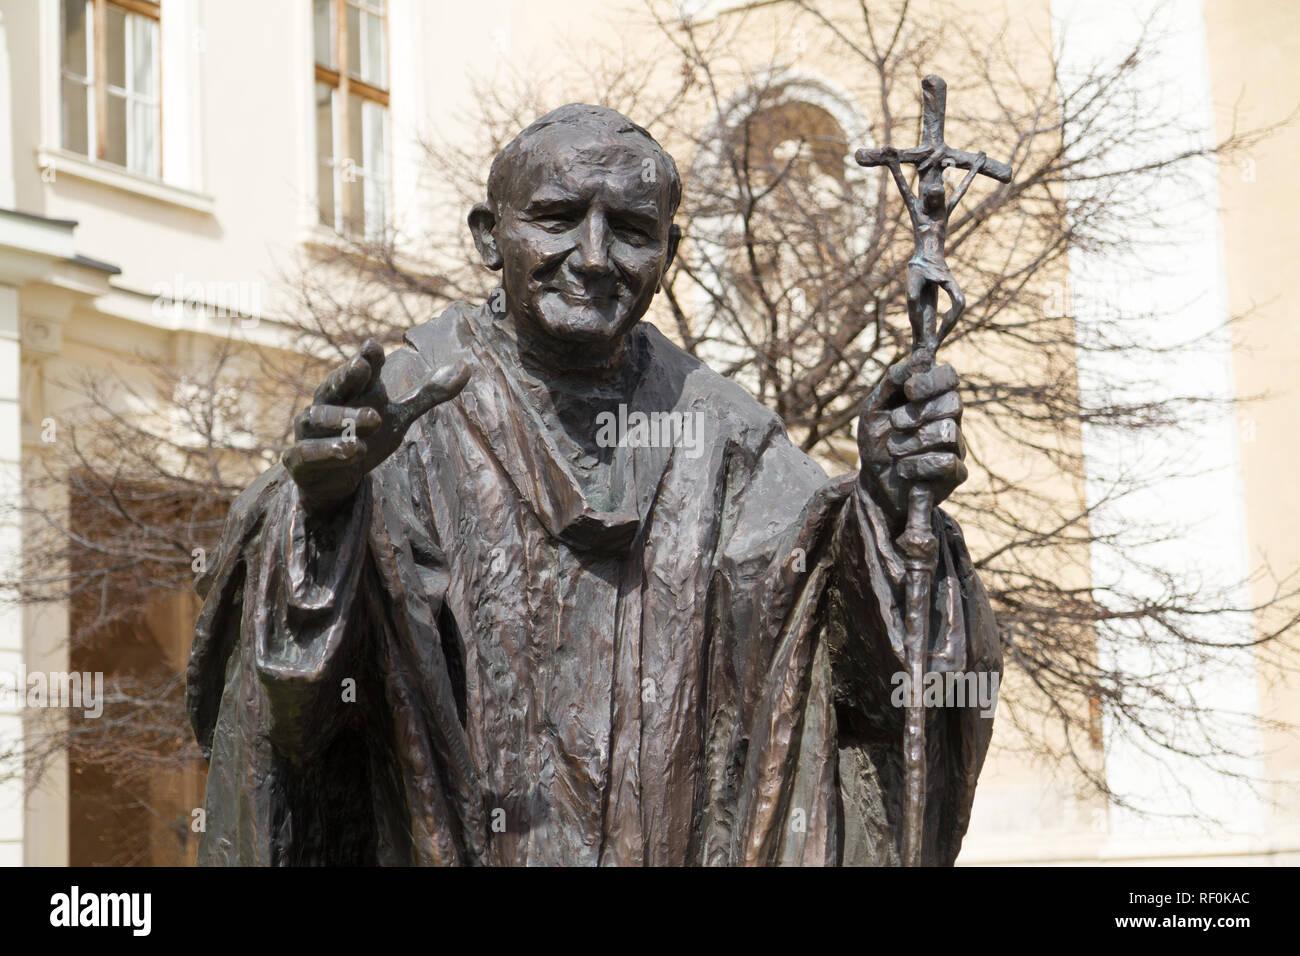 Trnava, Slovakia. 2018/4/12. A metal statue of Saint John Paul II in front of the Saint John the Baptist Cathedral. - Stock Image